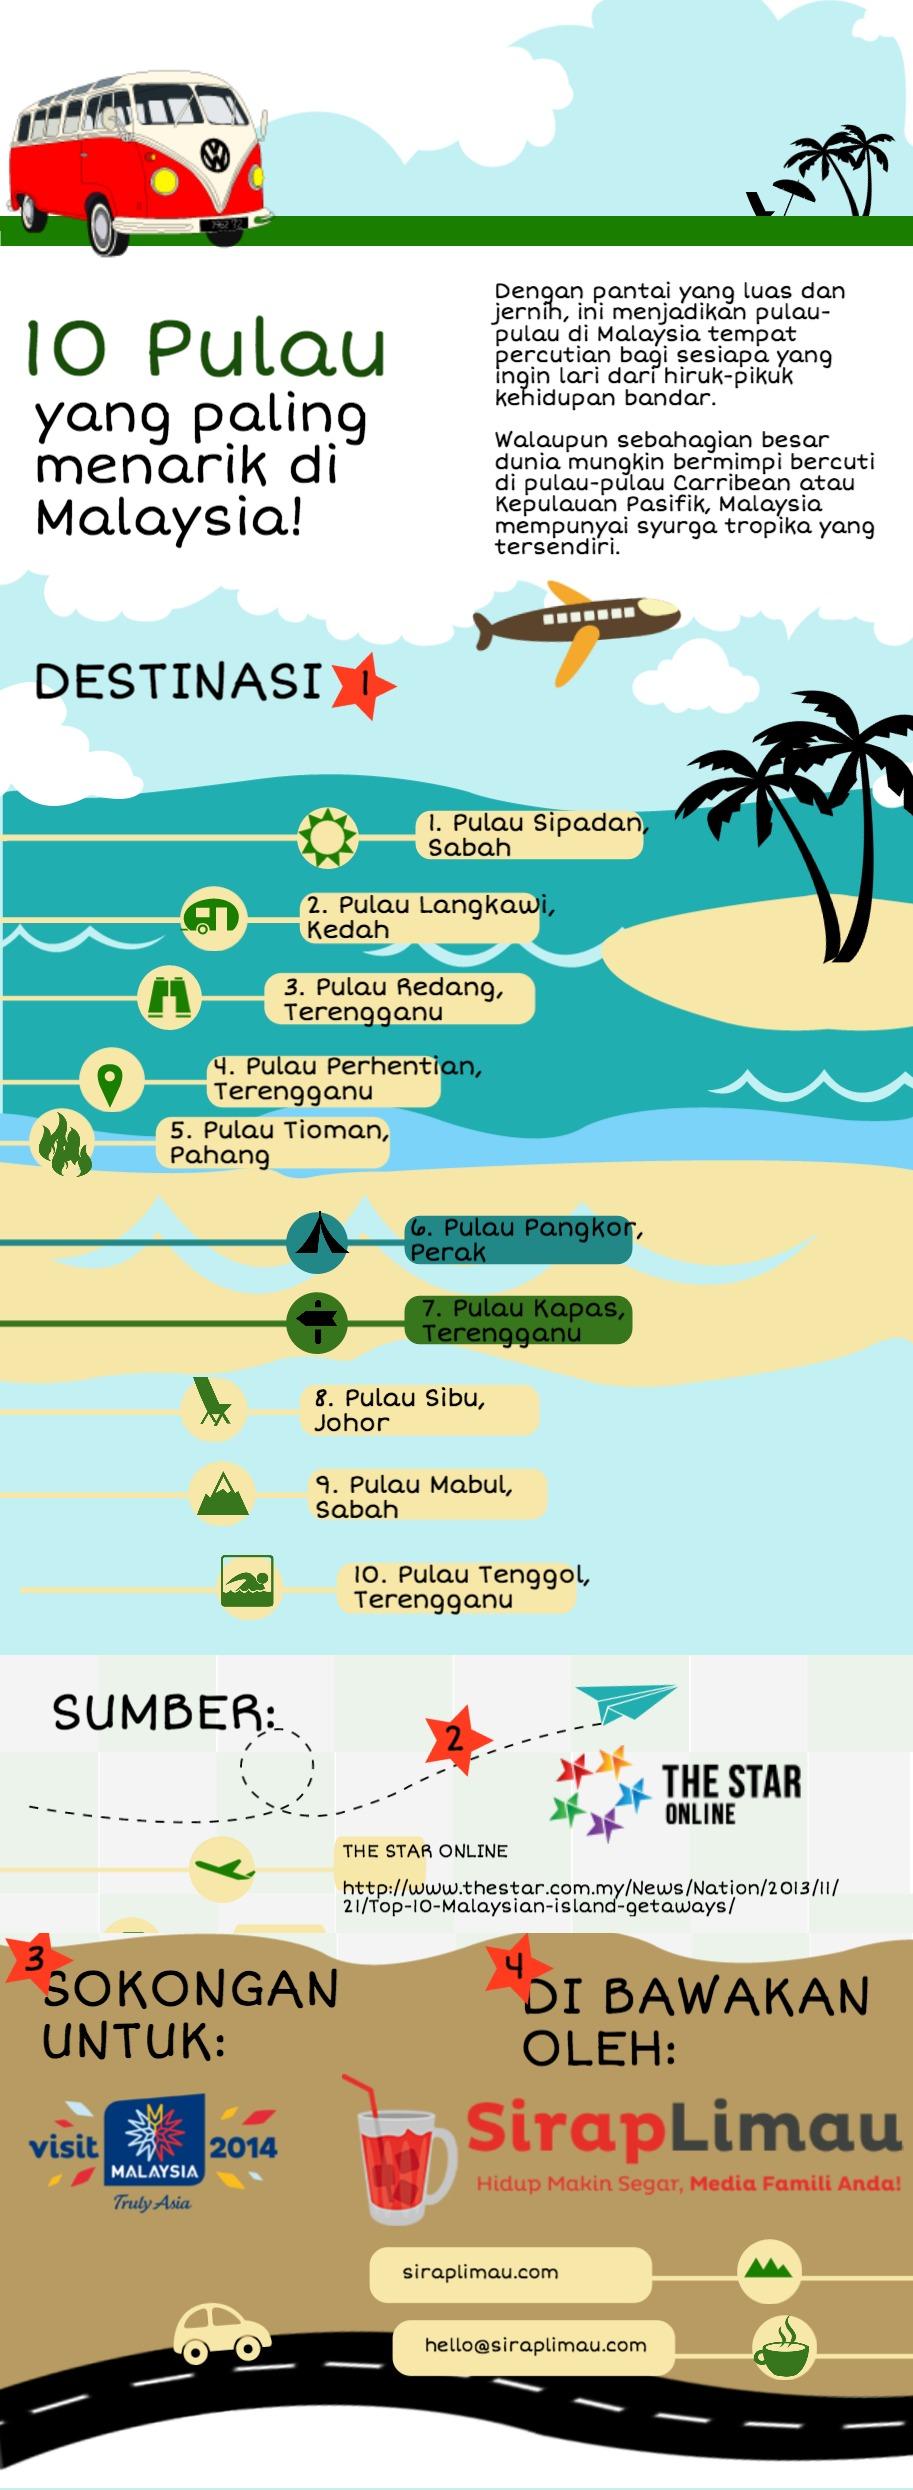 10 Pulau Paling Menarik Di Malaysia. Cantik & Eksotik!